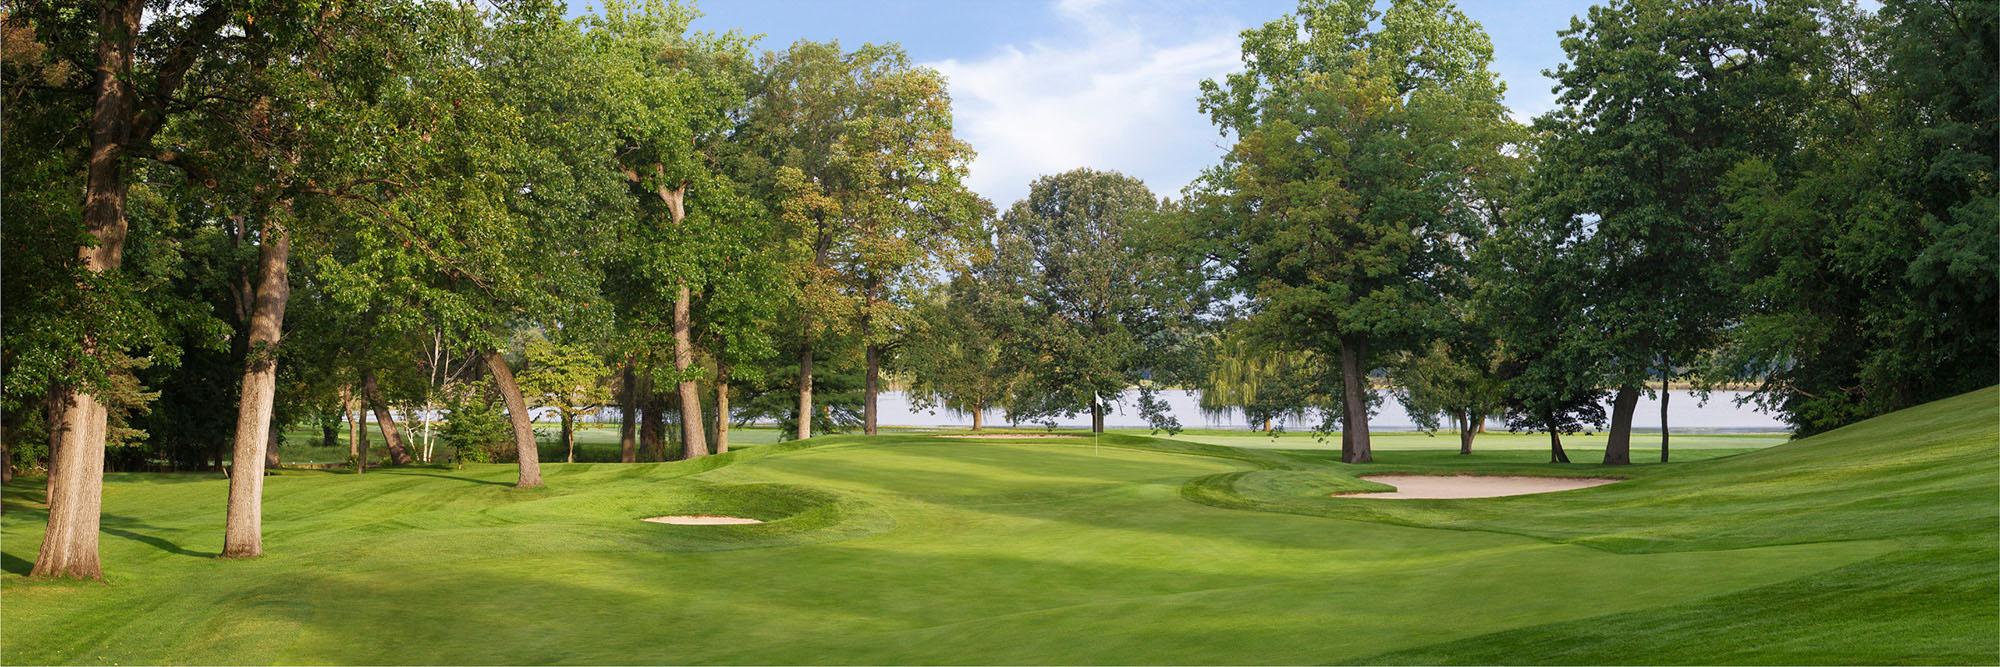 Golf Course Image - South Bend No. 10